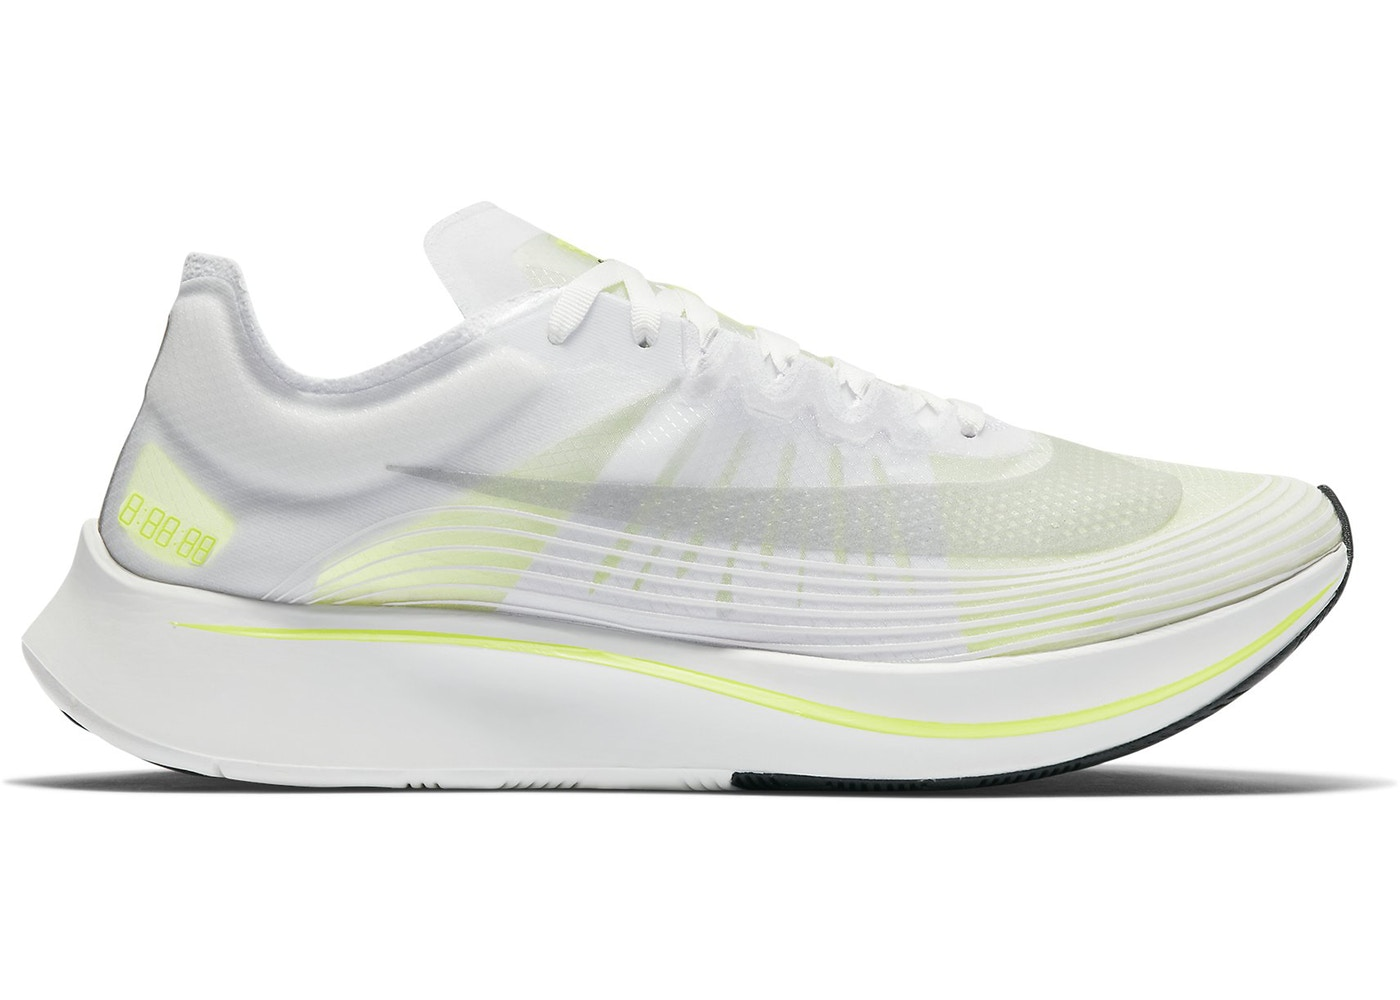 9a8c2325 Nike Zoom Fly White Volt - AJ9282-107